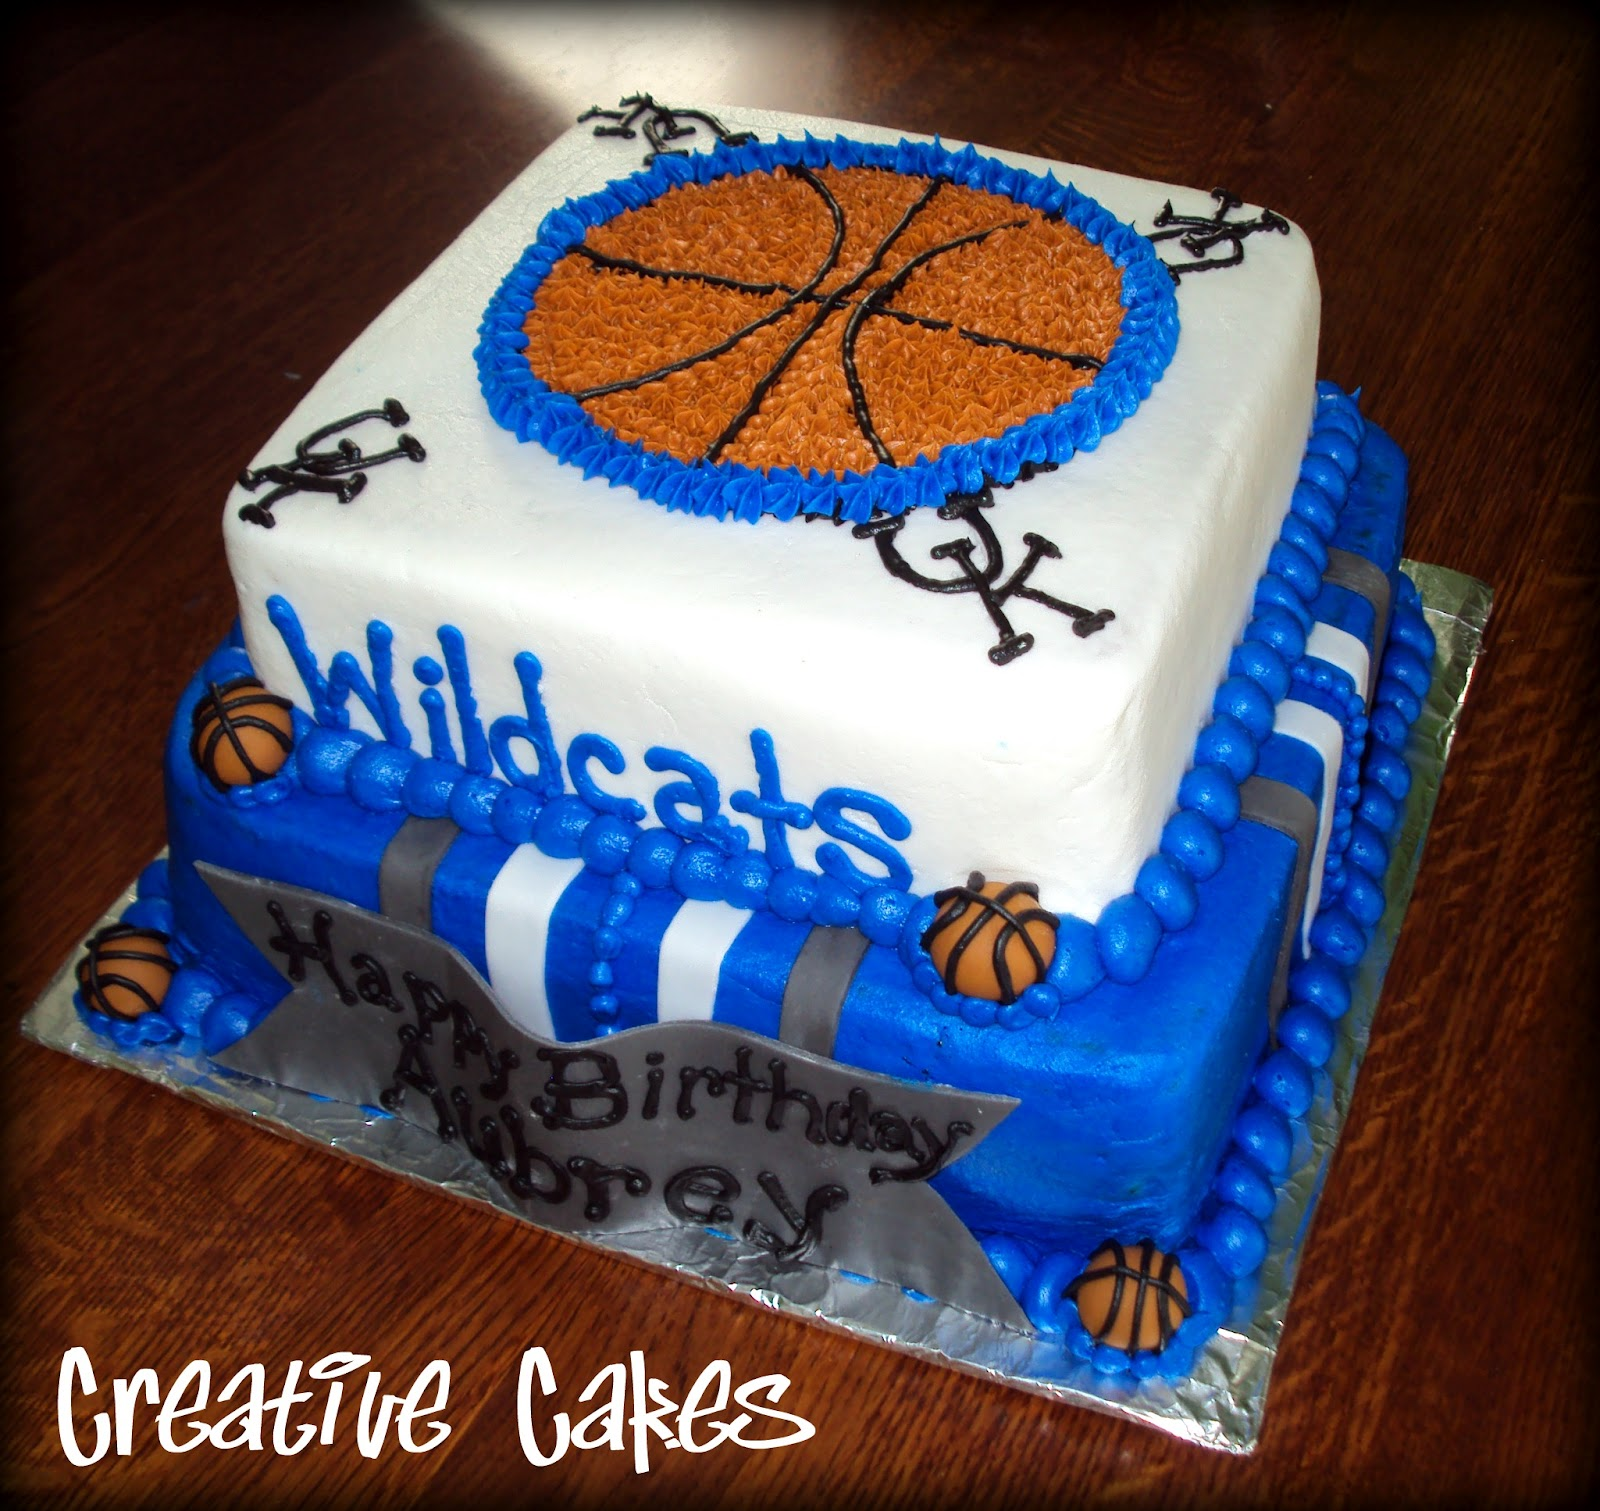 Creative Cakes February 2012